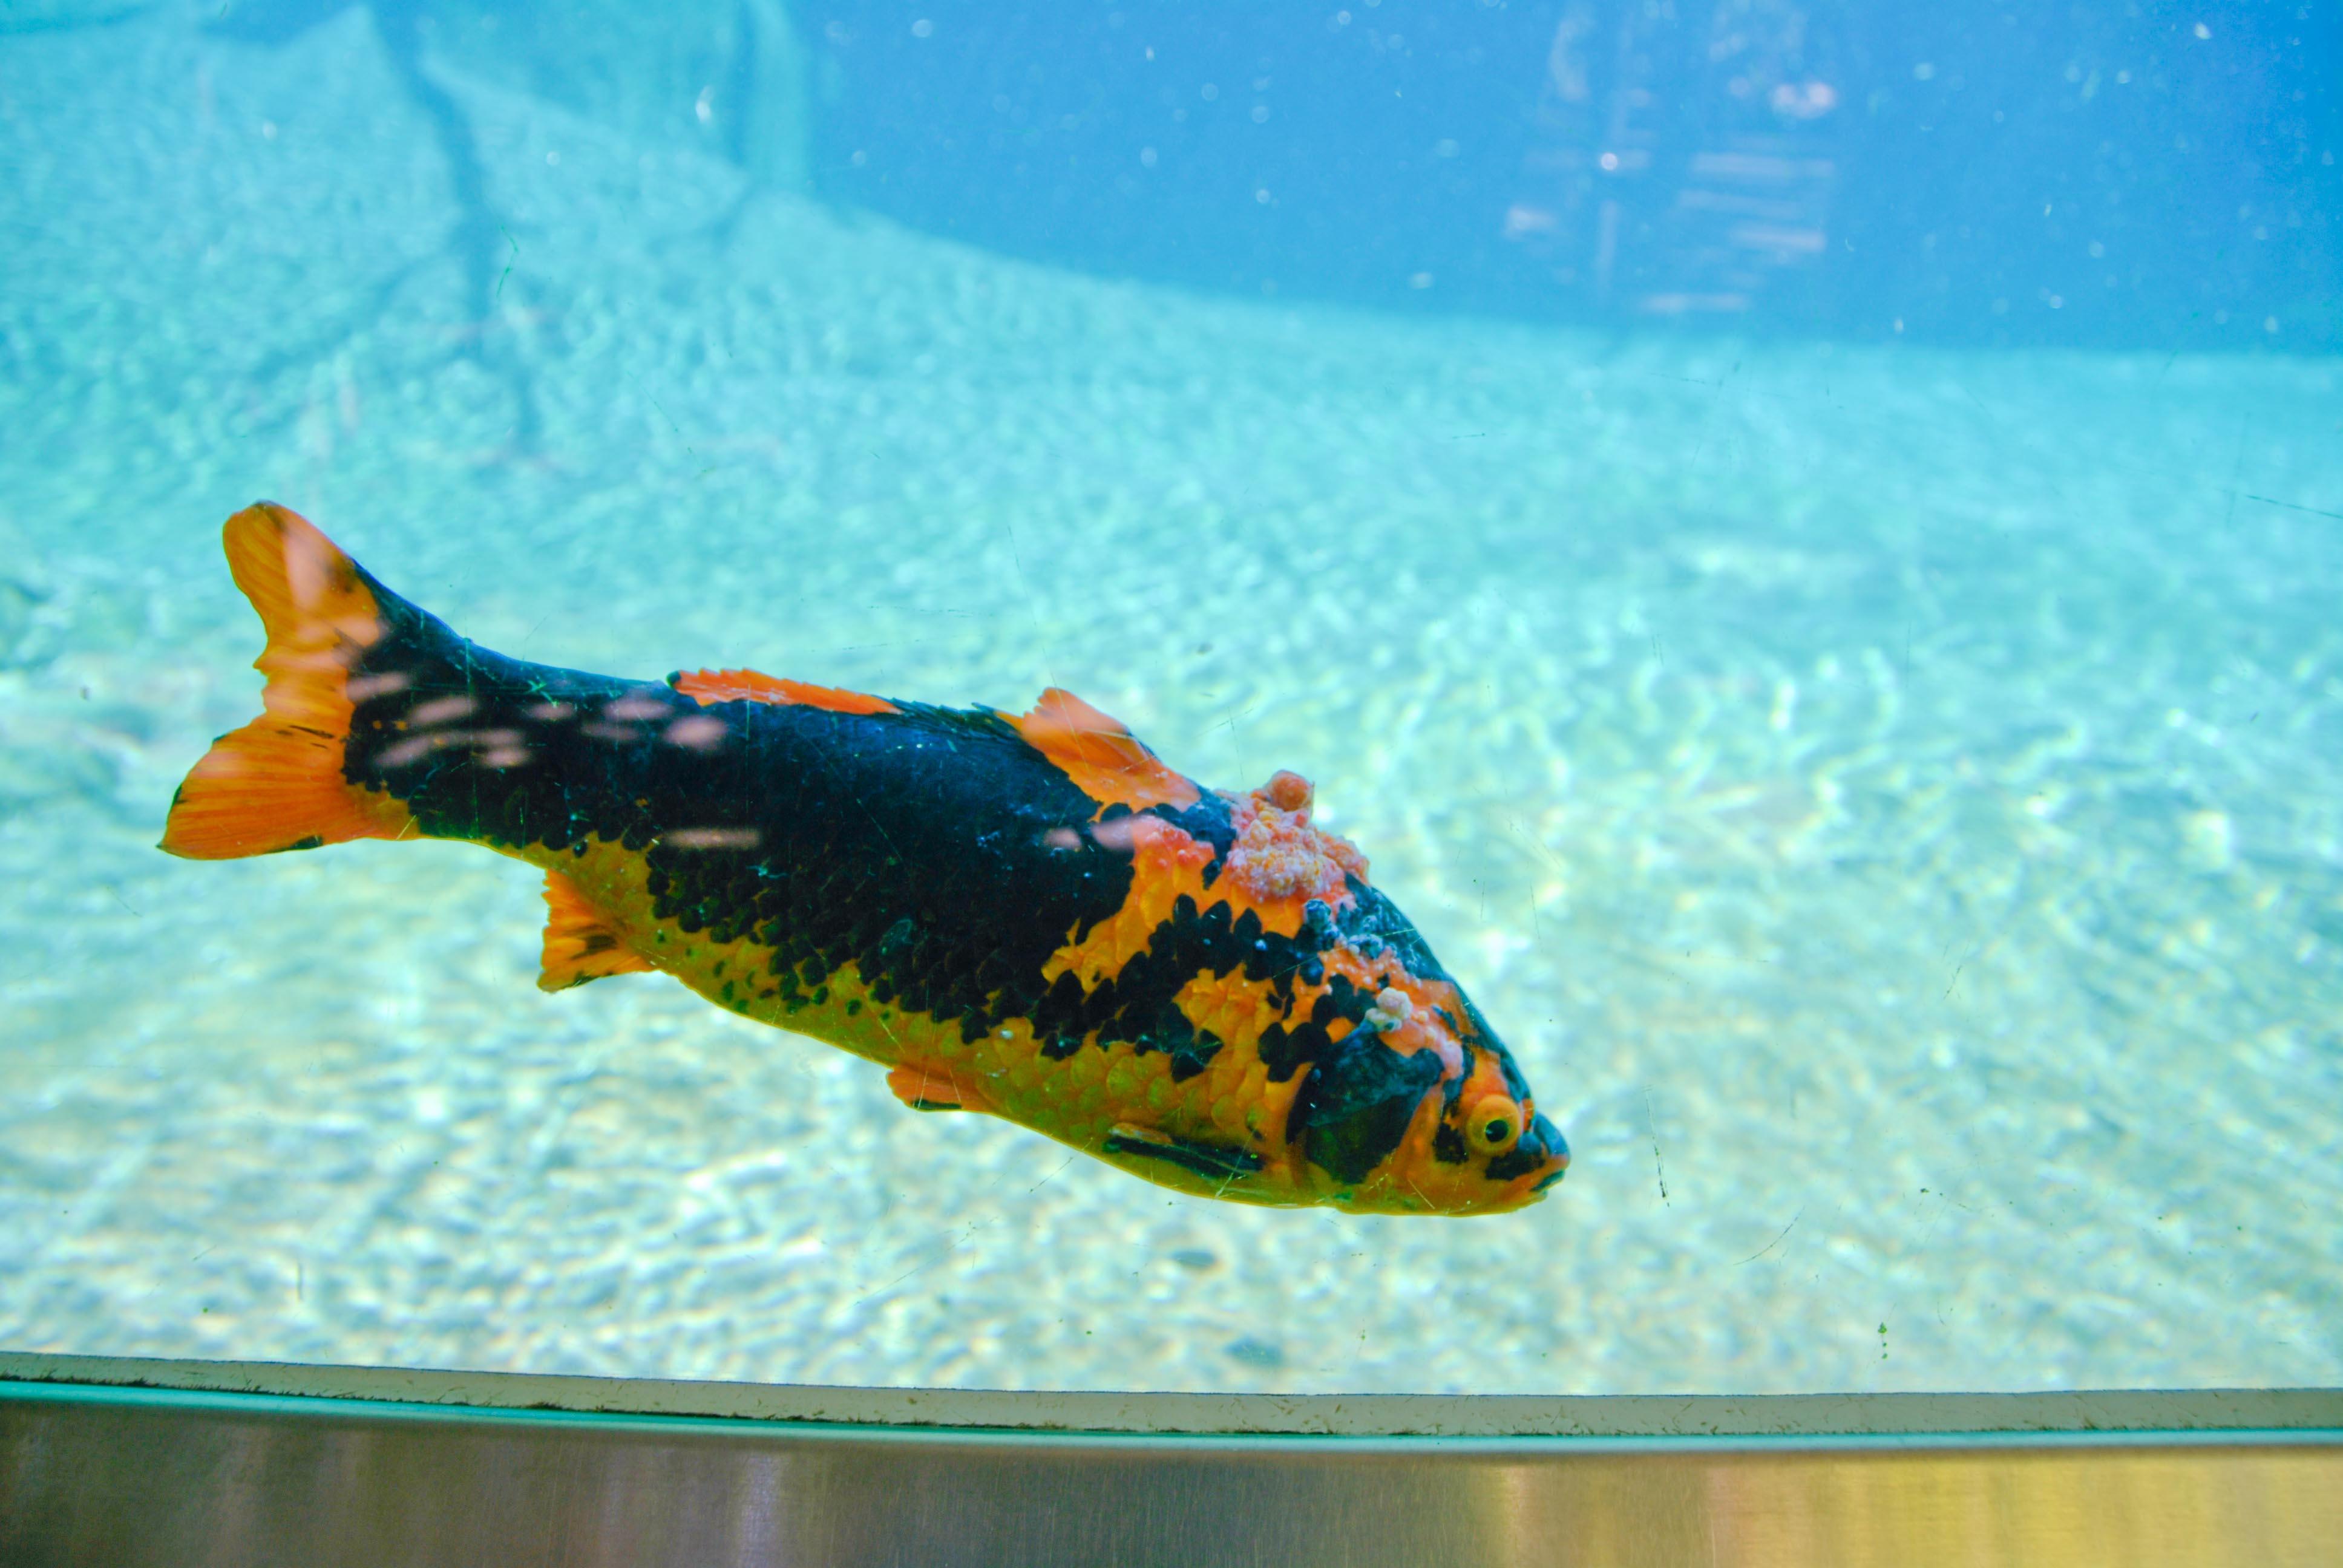 Fish aquarium in jeddah - _dsc7171